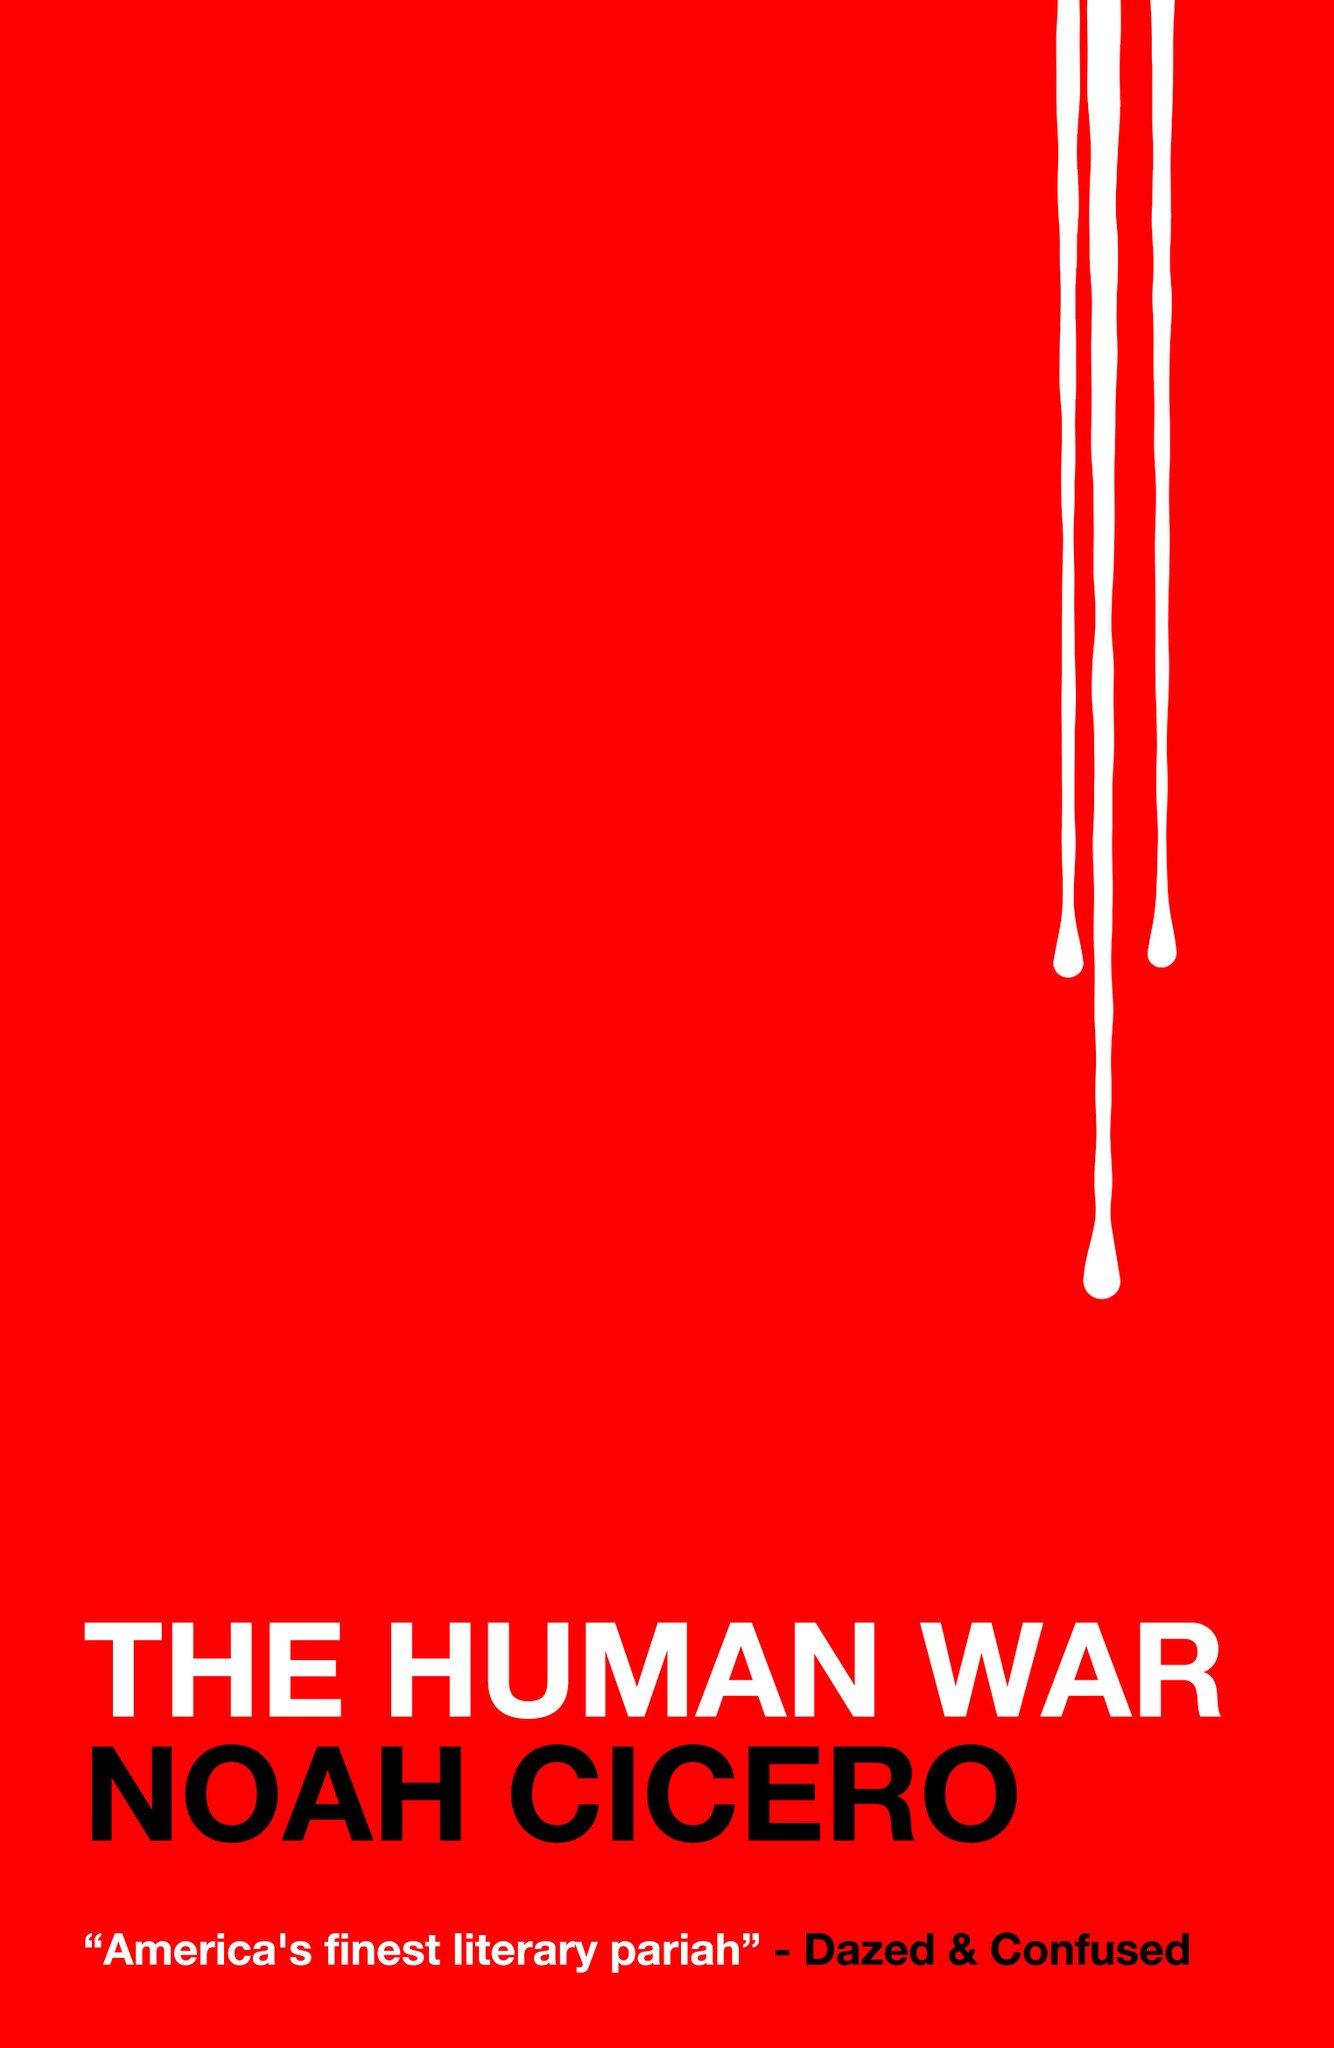 Noah Cicero the human war cover art